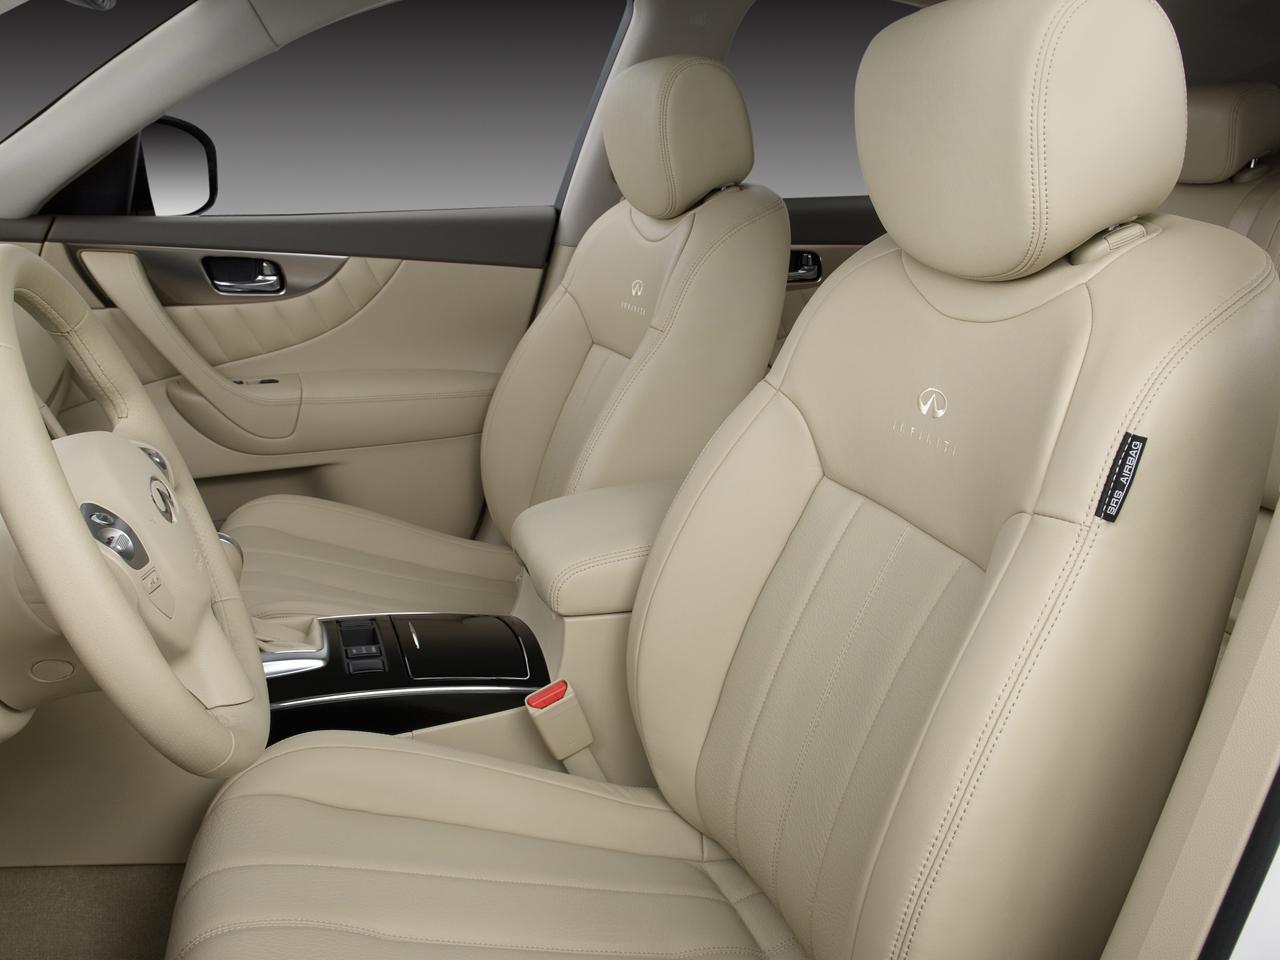 2009 infiniti fx35 latest news reviews and auto show coverage 4050 vanachro Choice Image